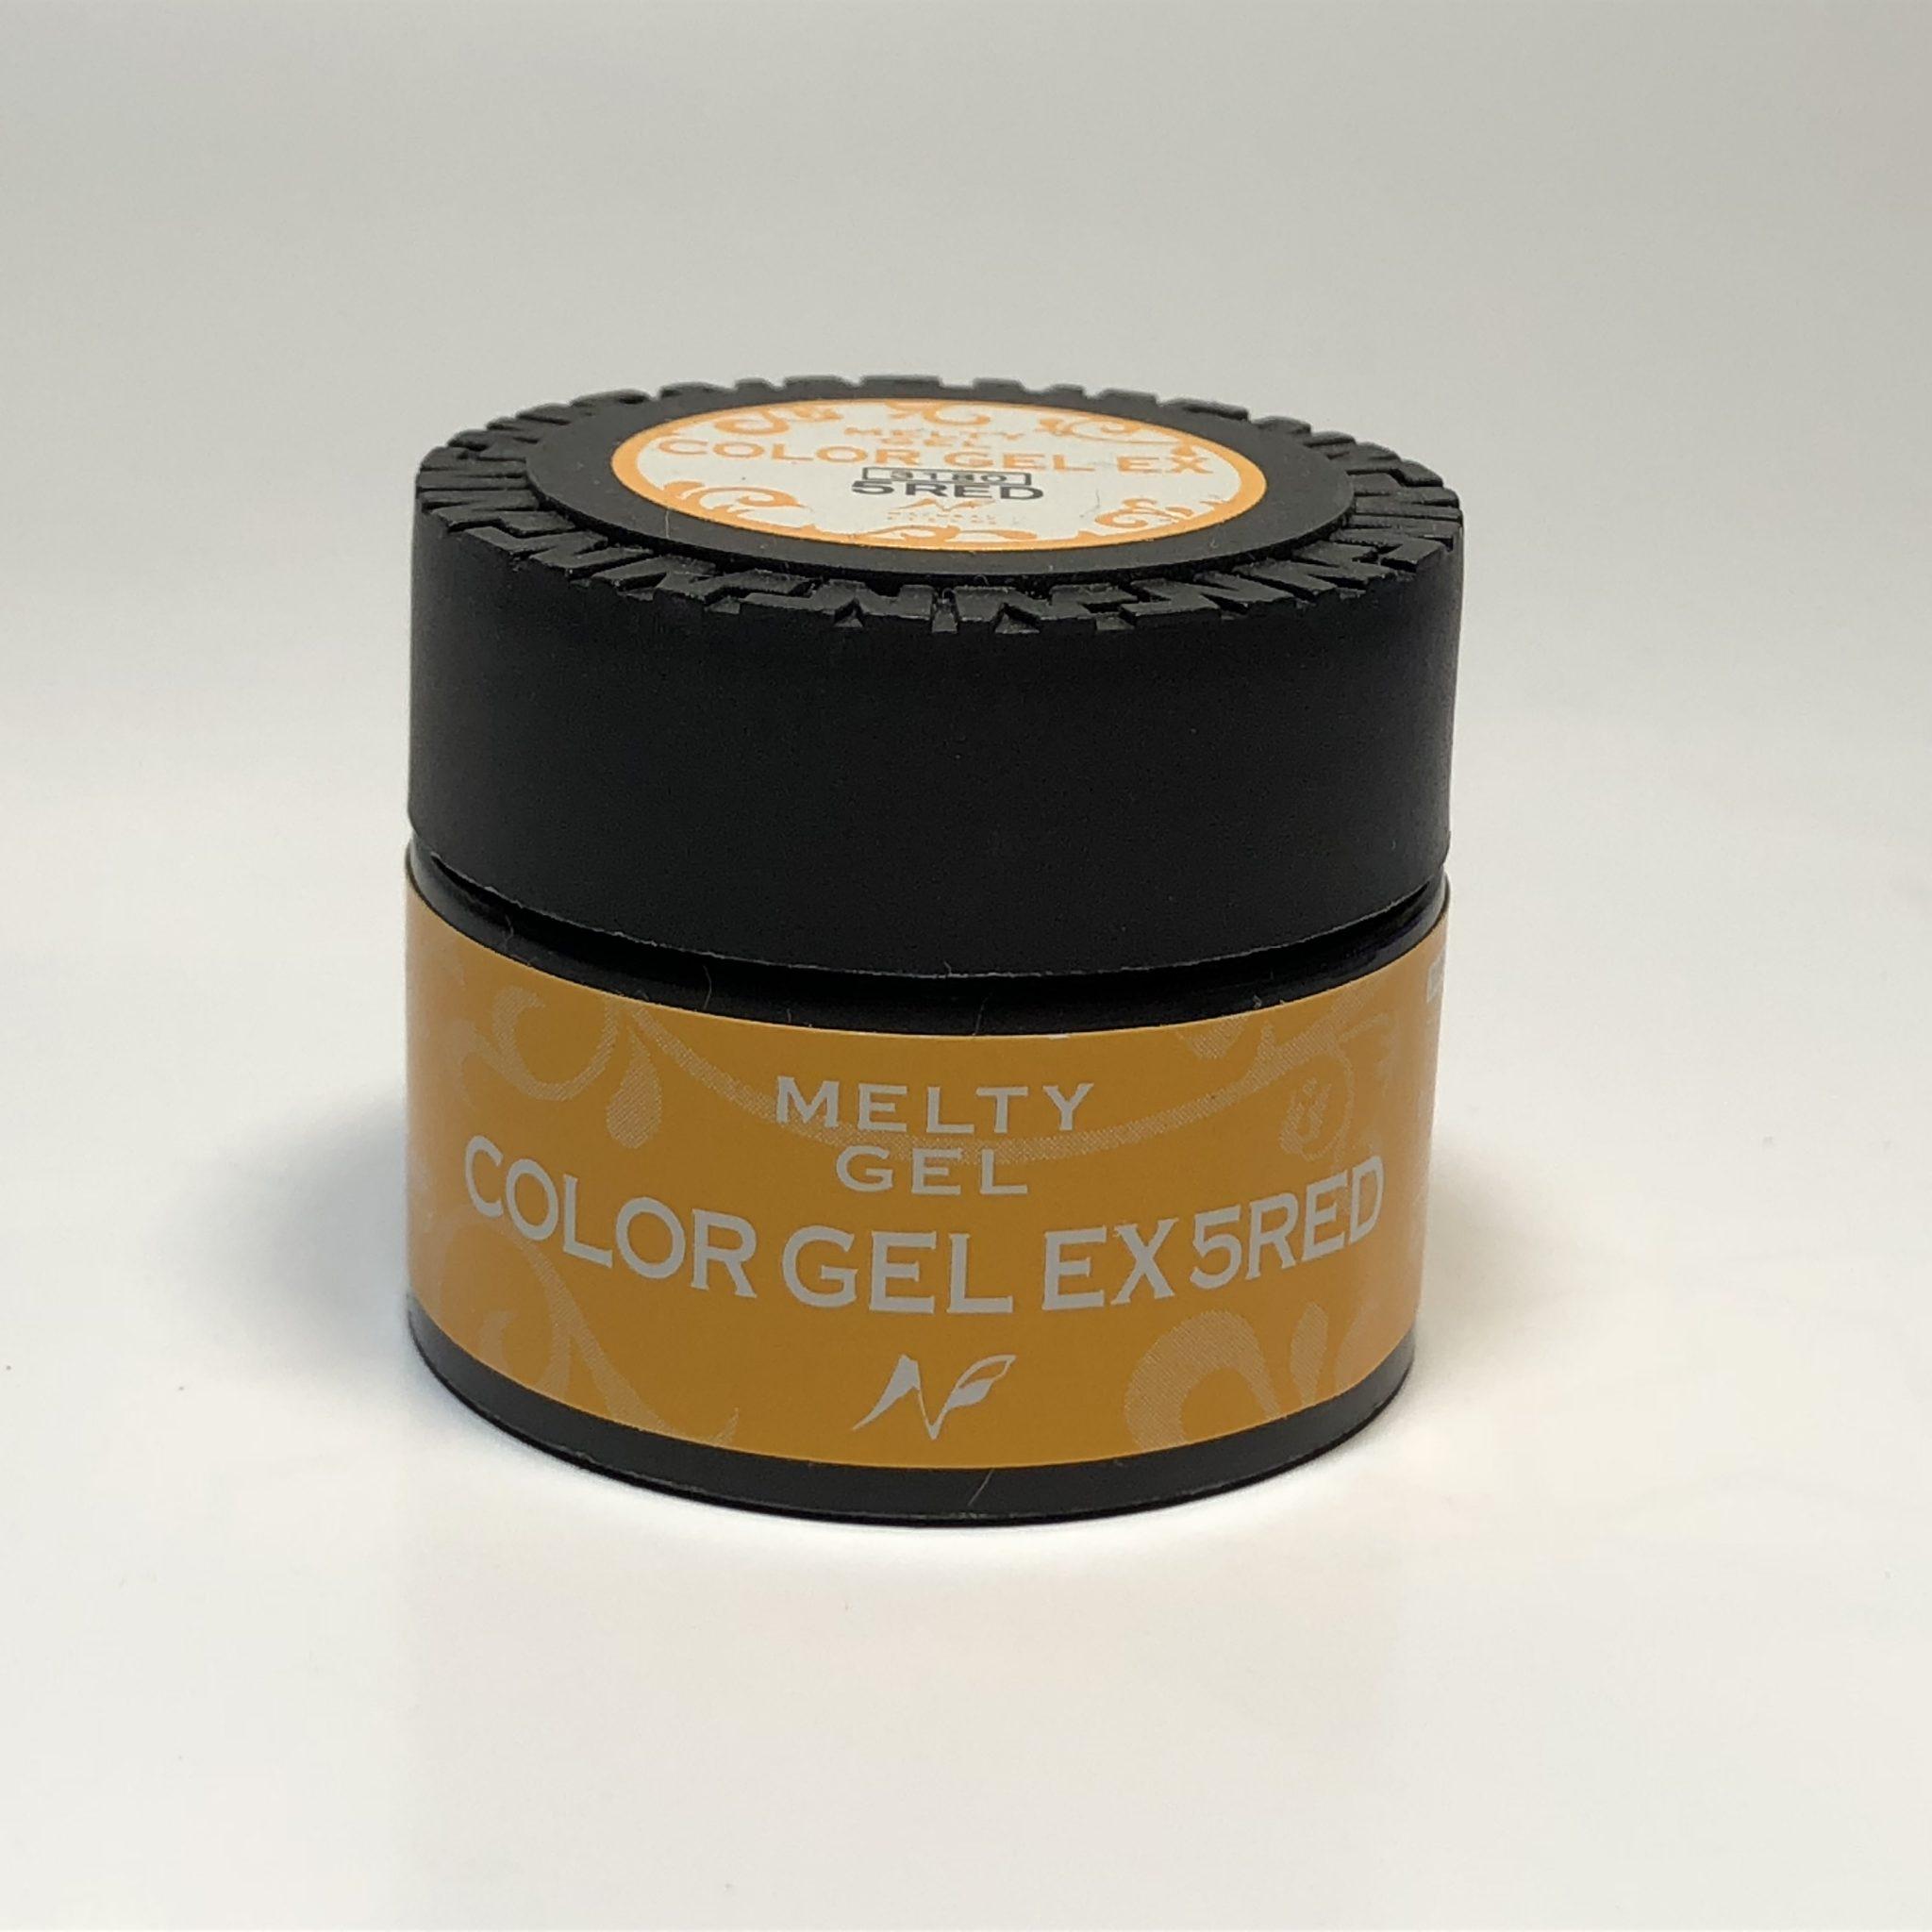 Melty Gel(メルティジェル) カラージェルEX 5RED(ファイブレッド)